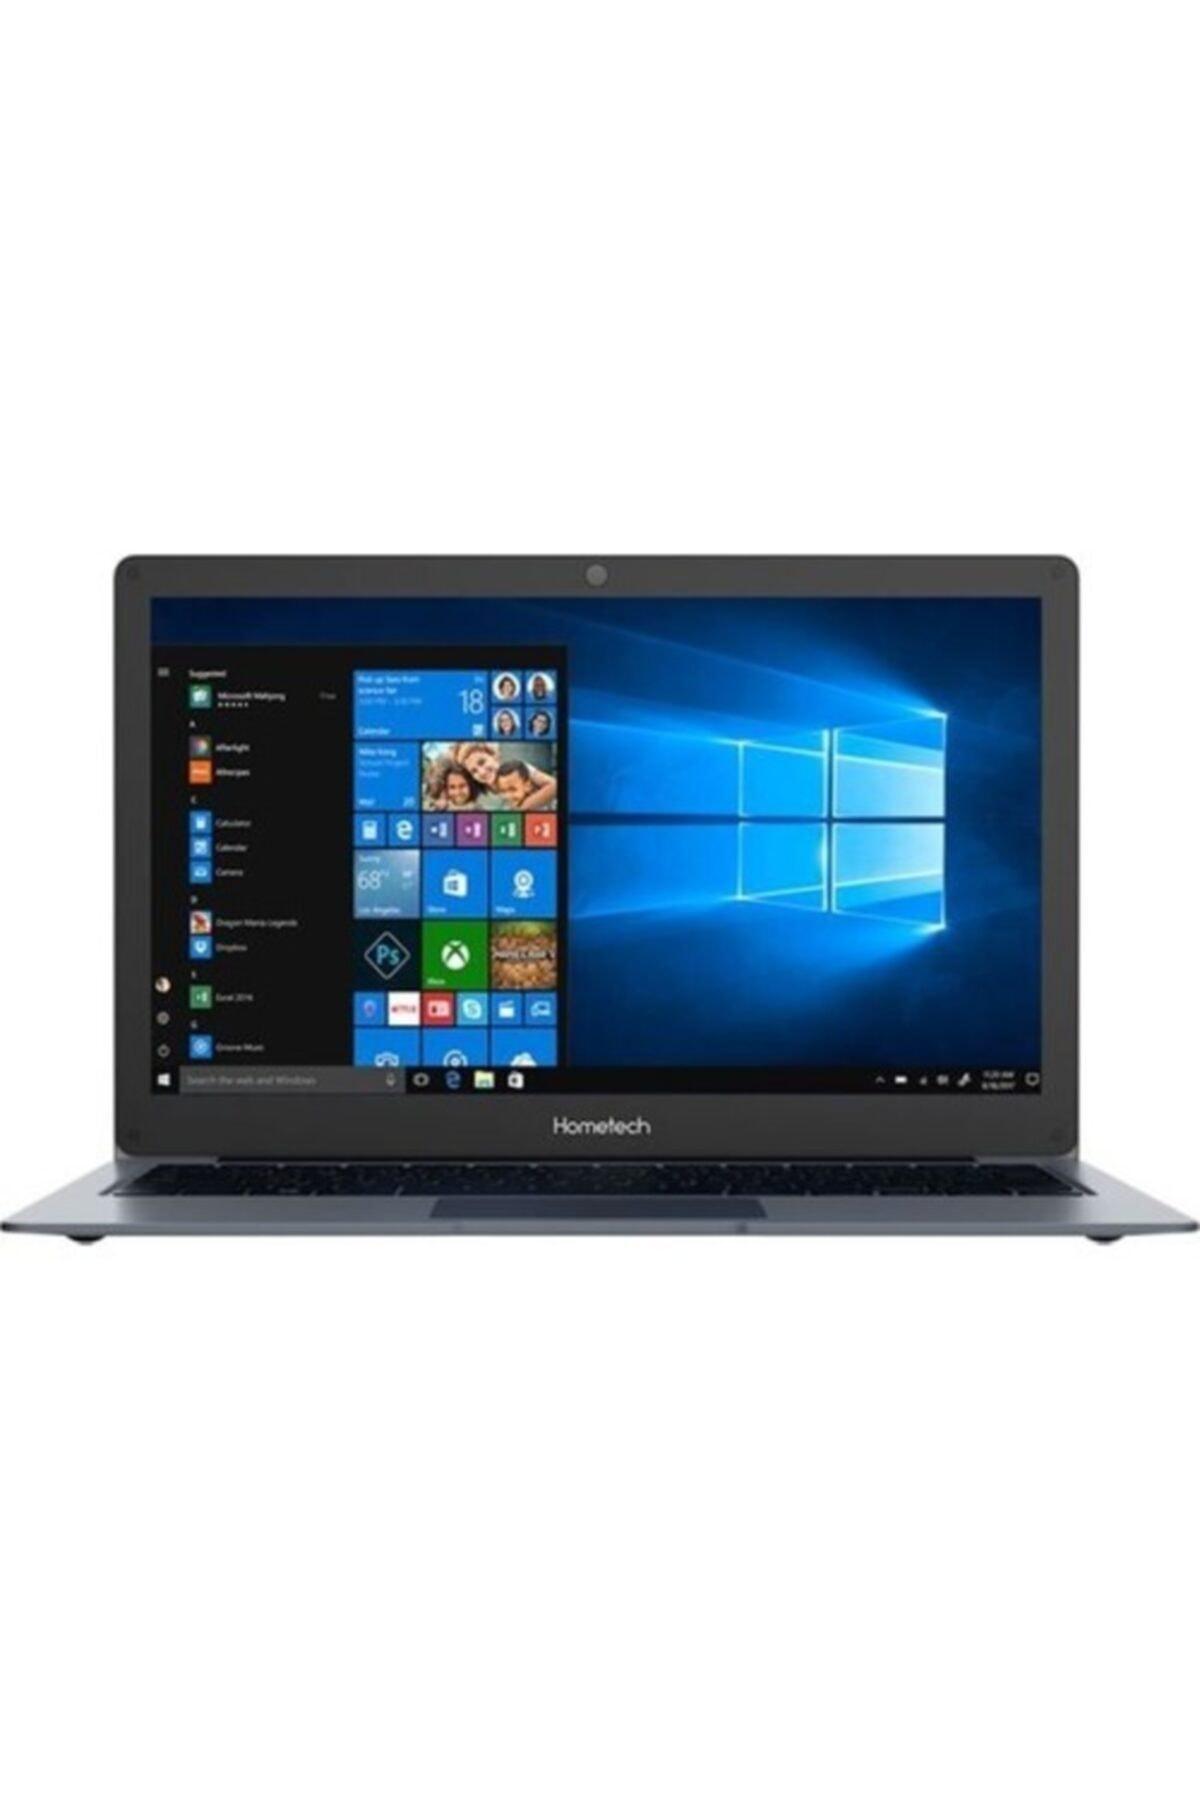 Alfa 400c Intel Celeron N3350 3gb 32gb Emmc Windows 10 Home 13.3